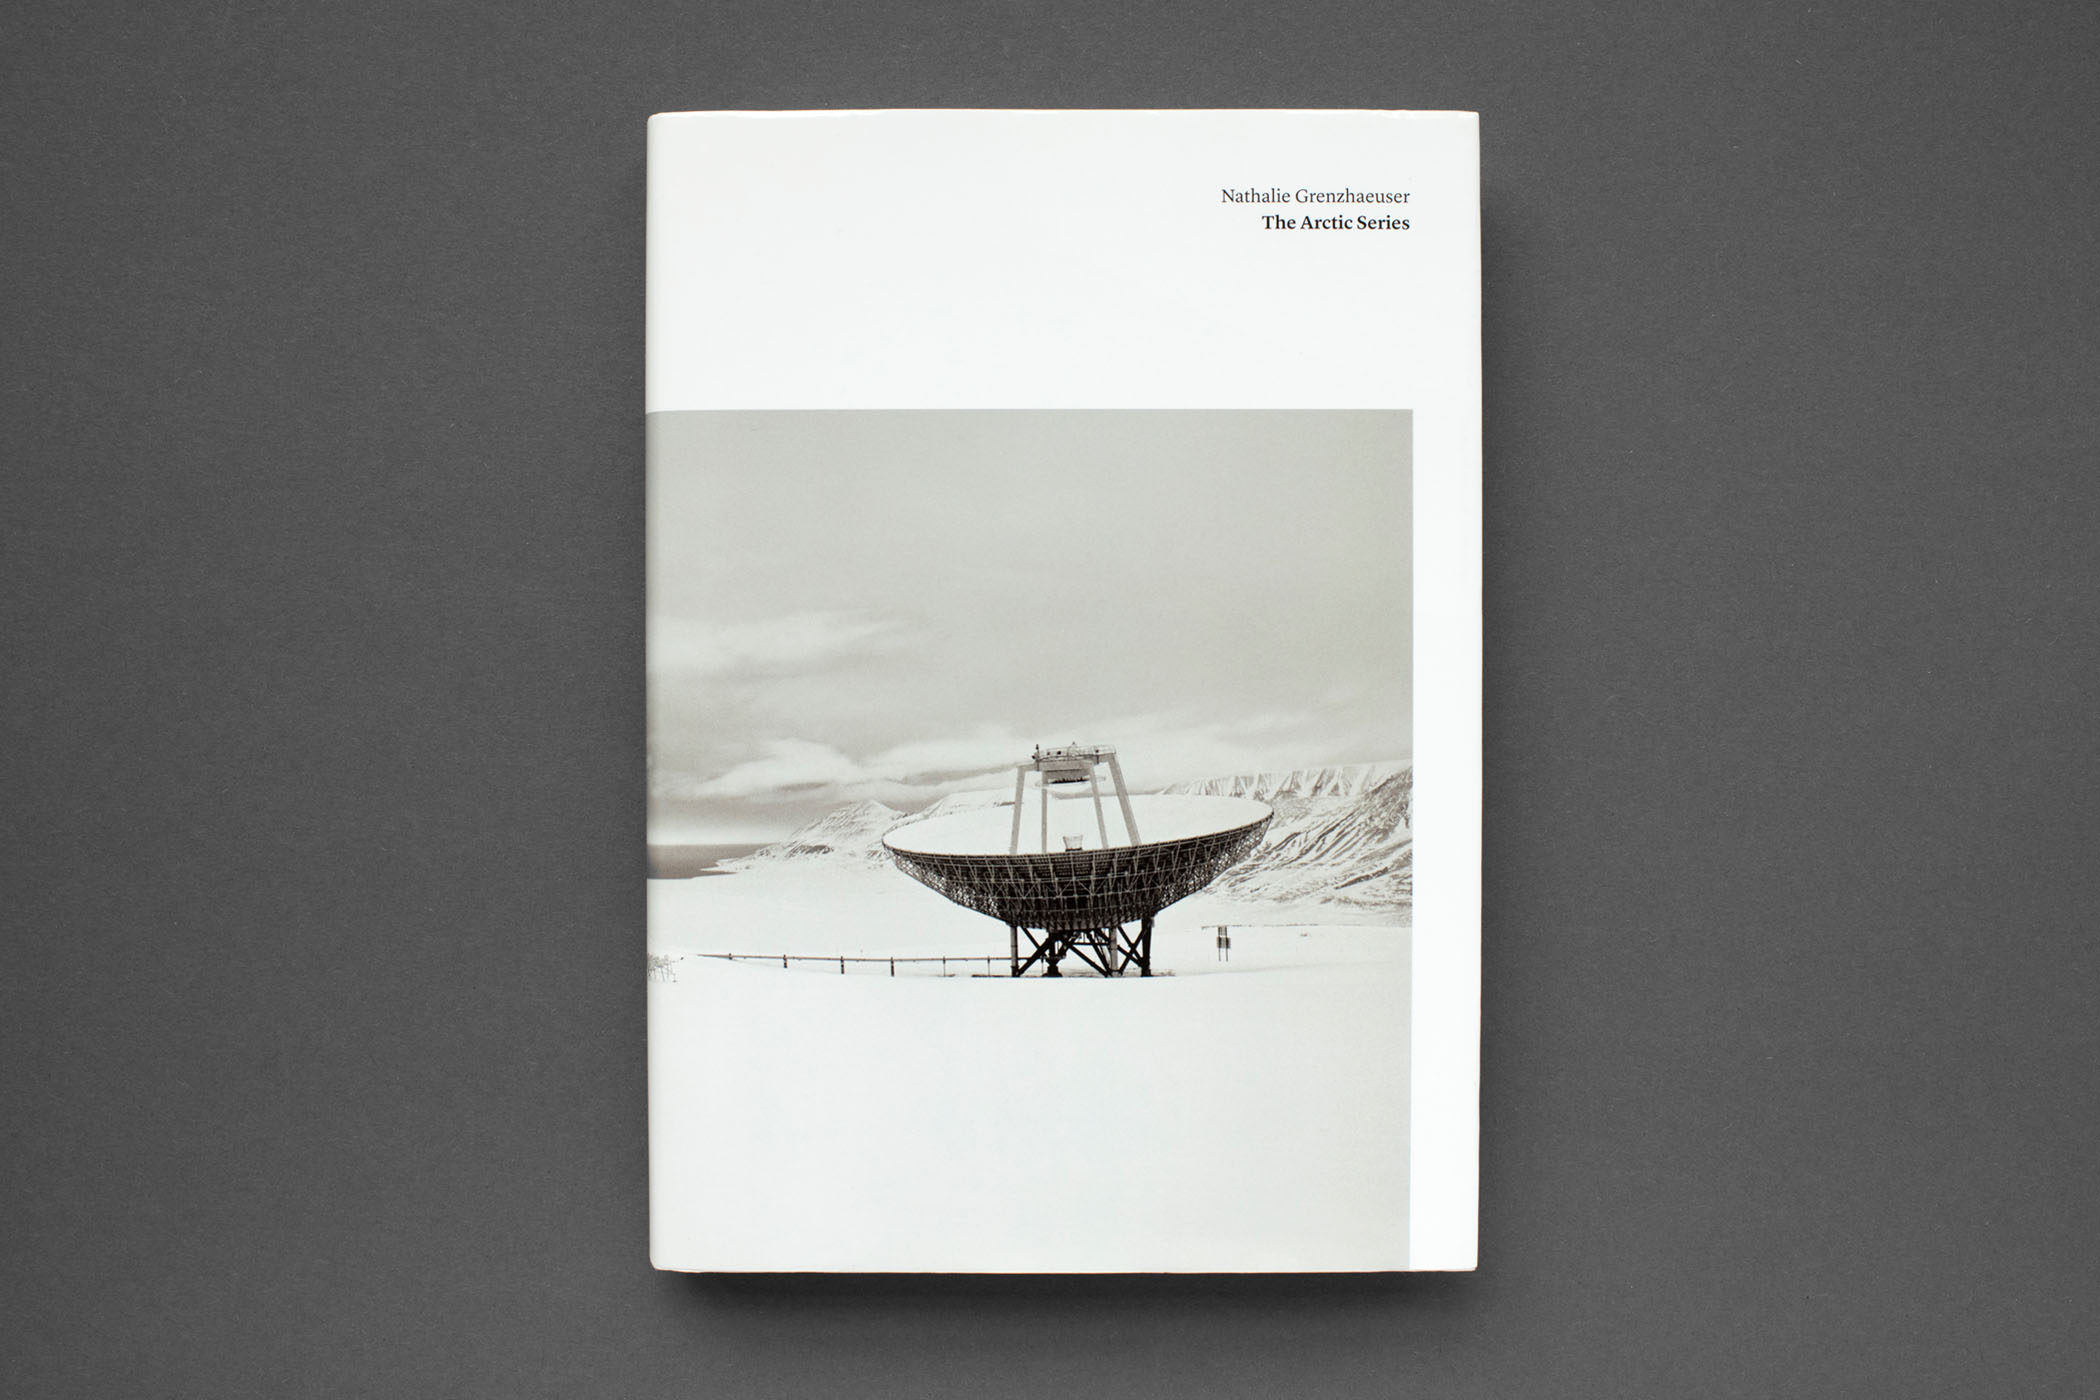 Nathalie Grenzhaeuser: Arctic Series